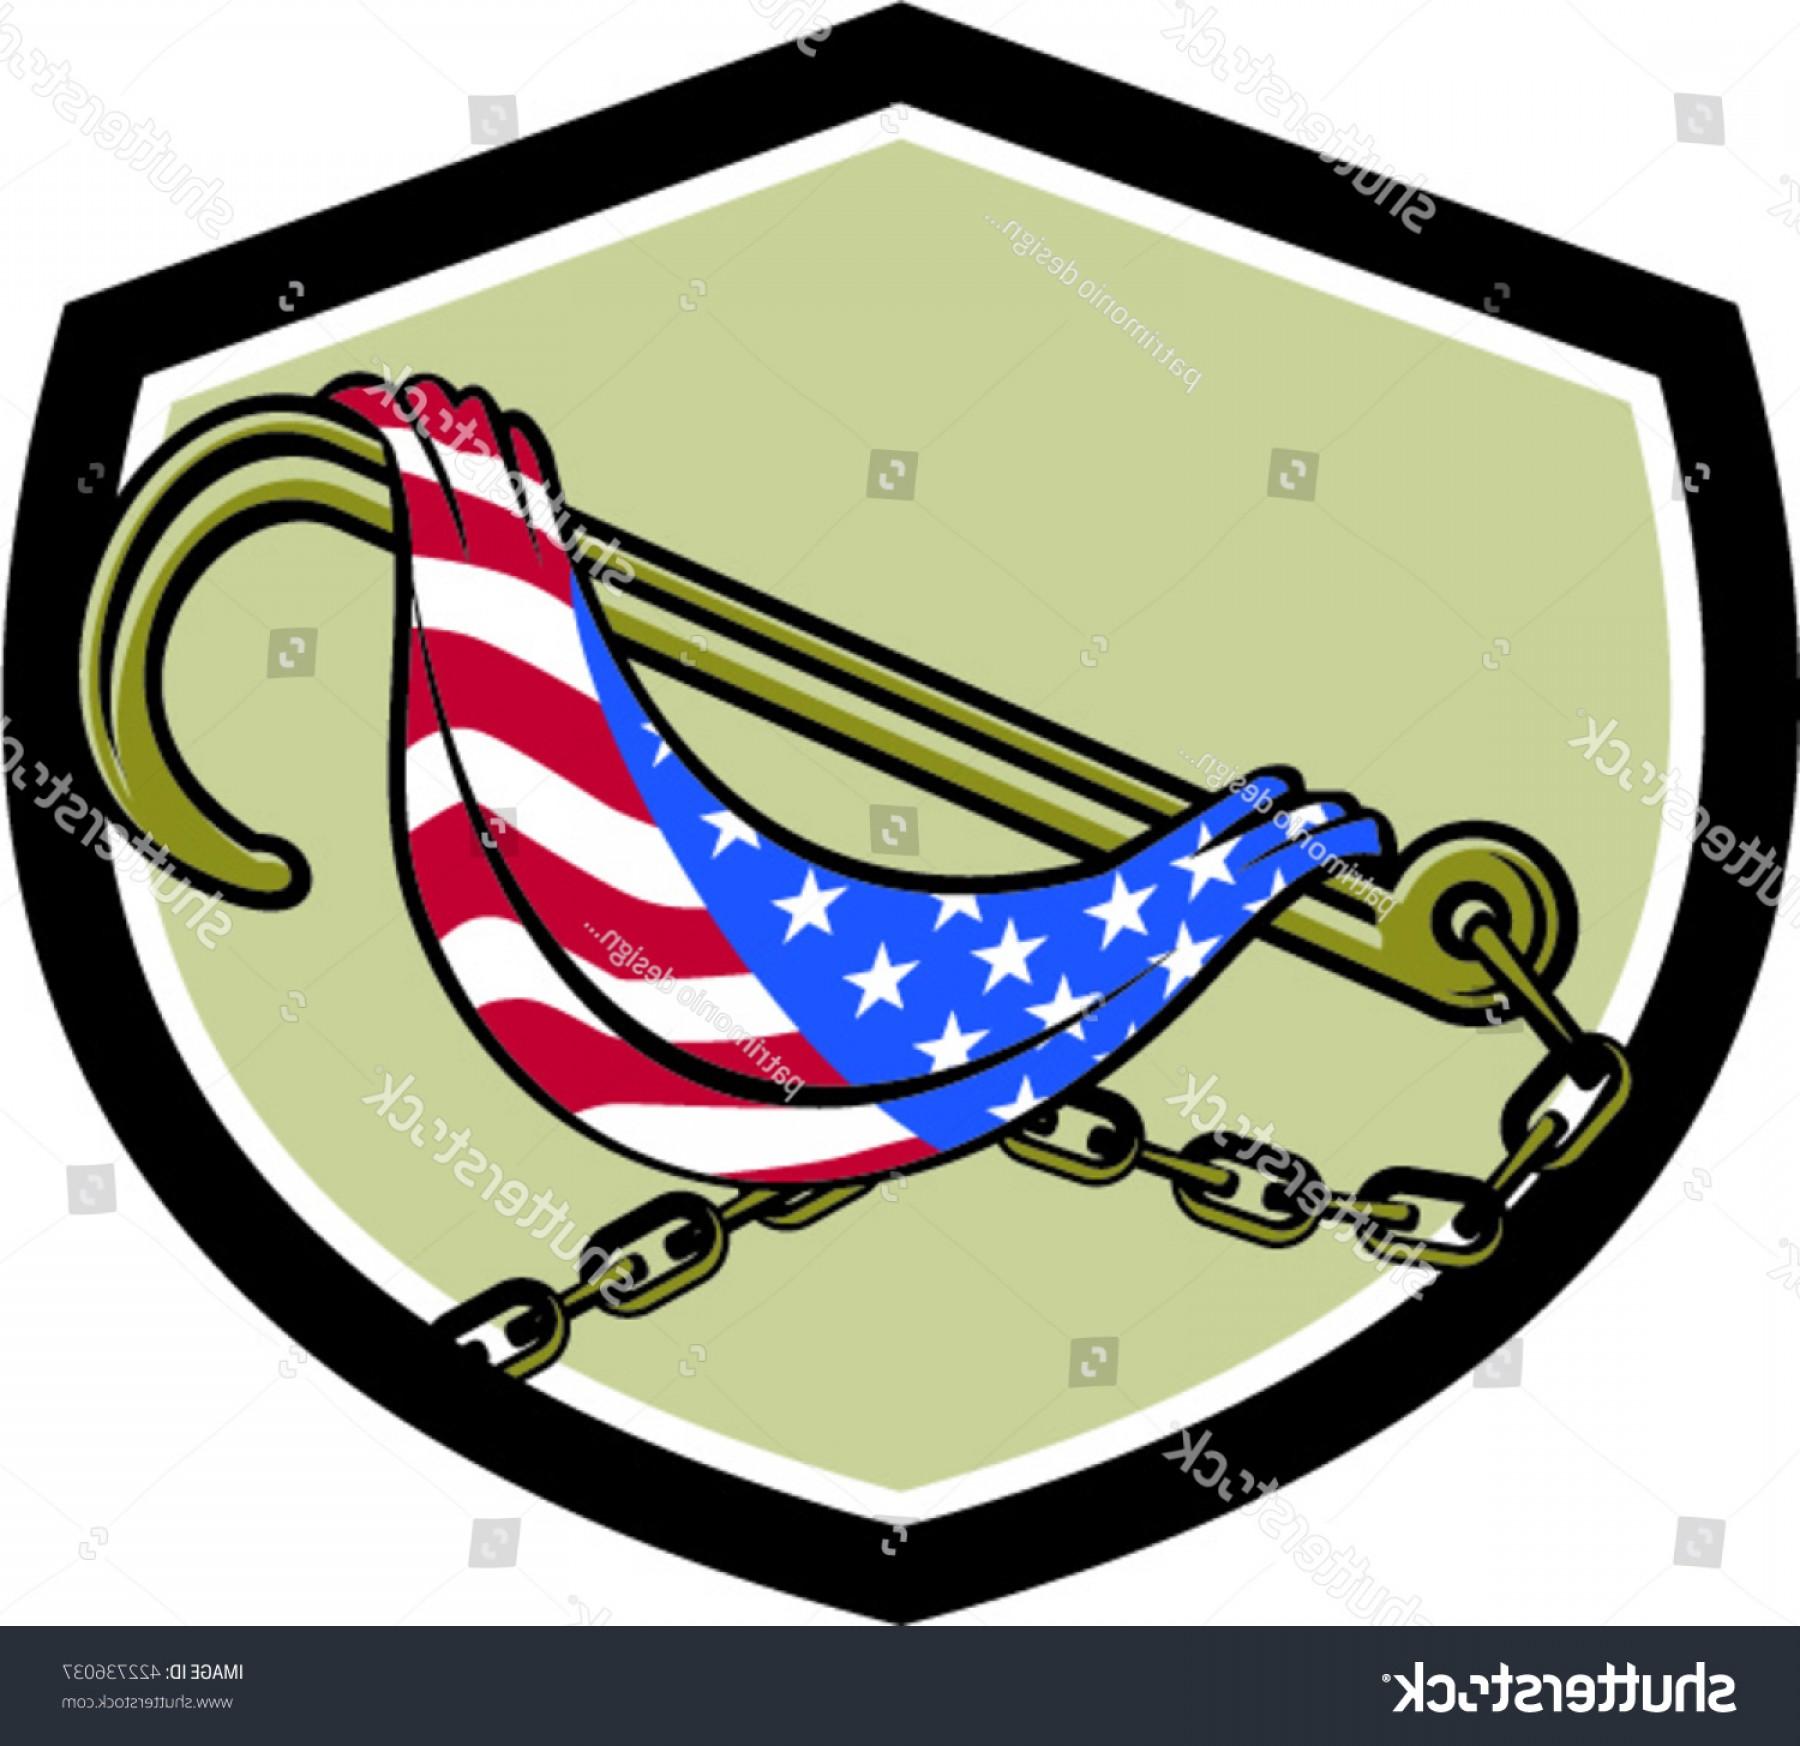 1800x1746 Illustration Towing J Hook Chain Draped Shopatcloth